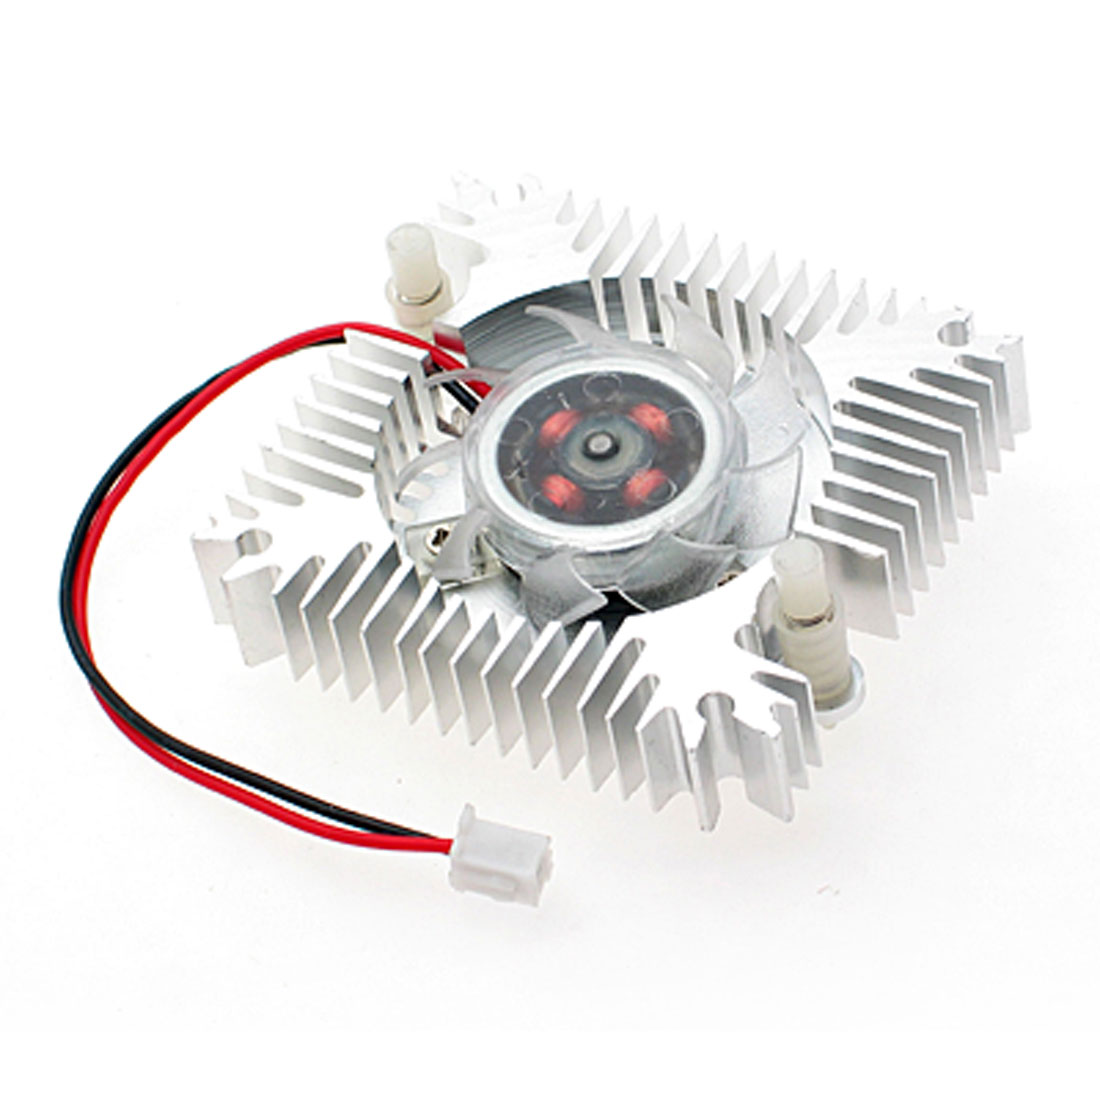 PC VGA Video Card 2 Pin 55mm Cooler Cooling Fan Heatsink DC 12V